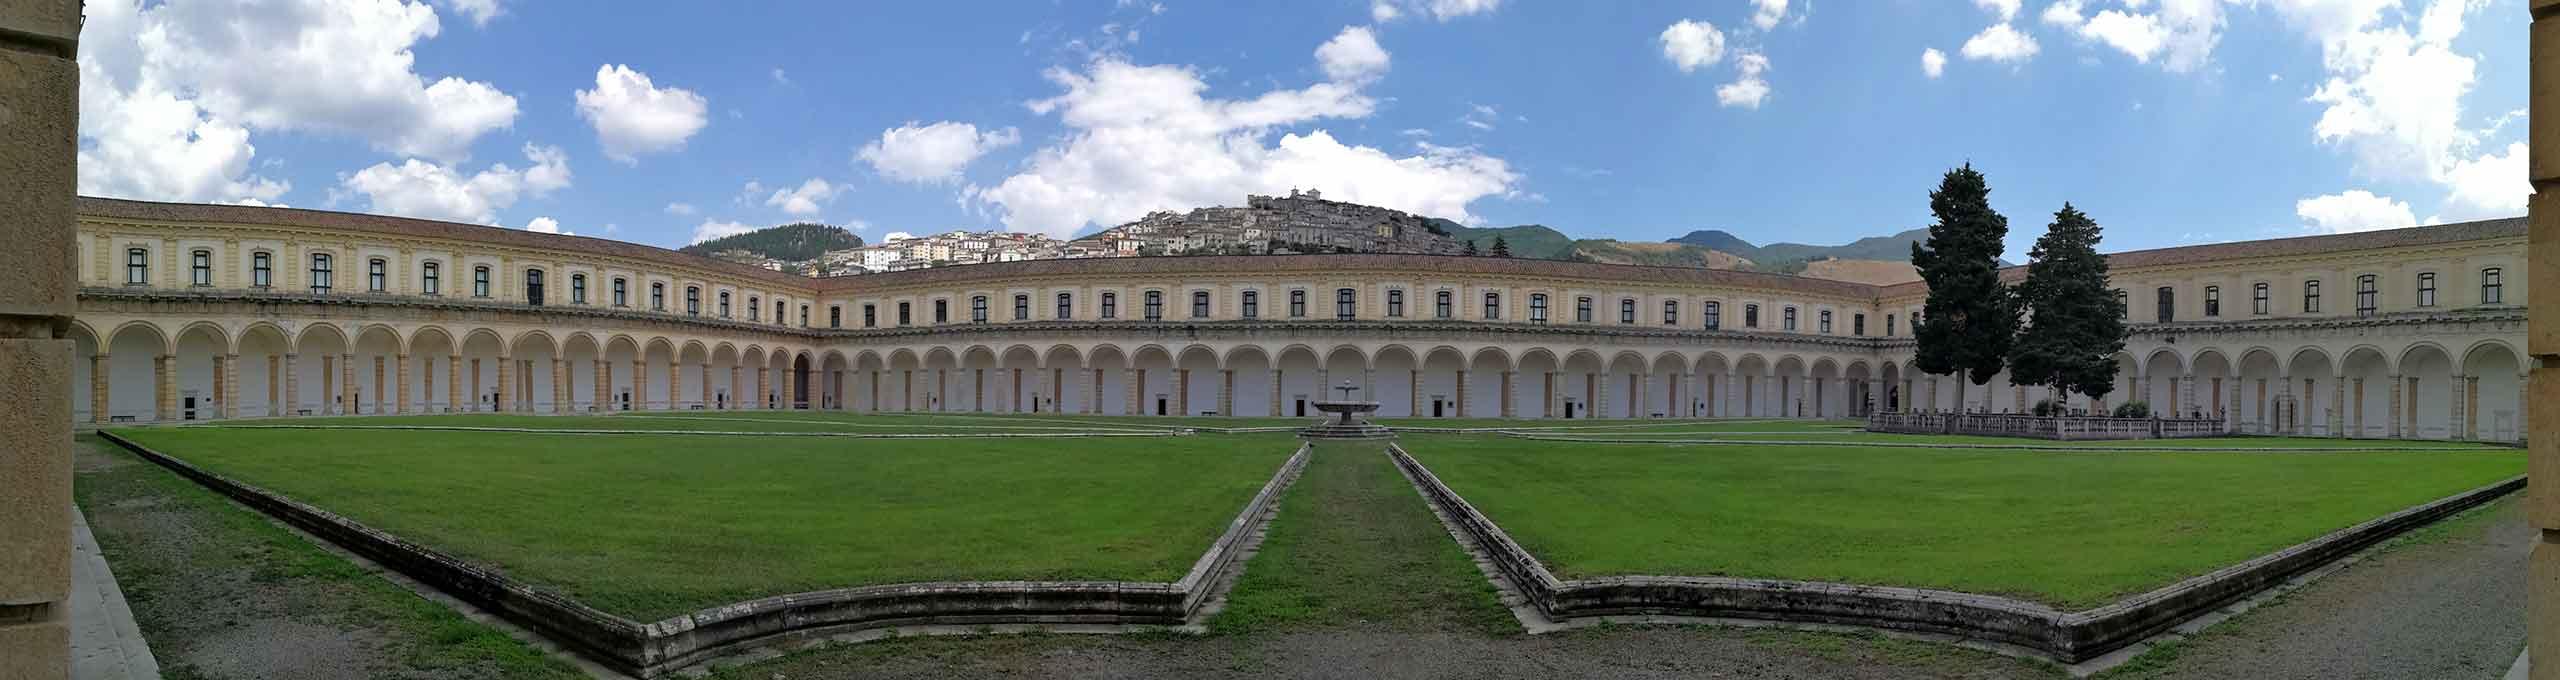 Padula, Cilento, Certosa di San Lorenzo